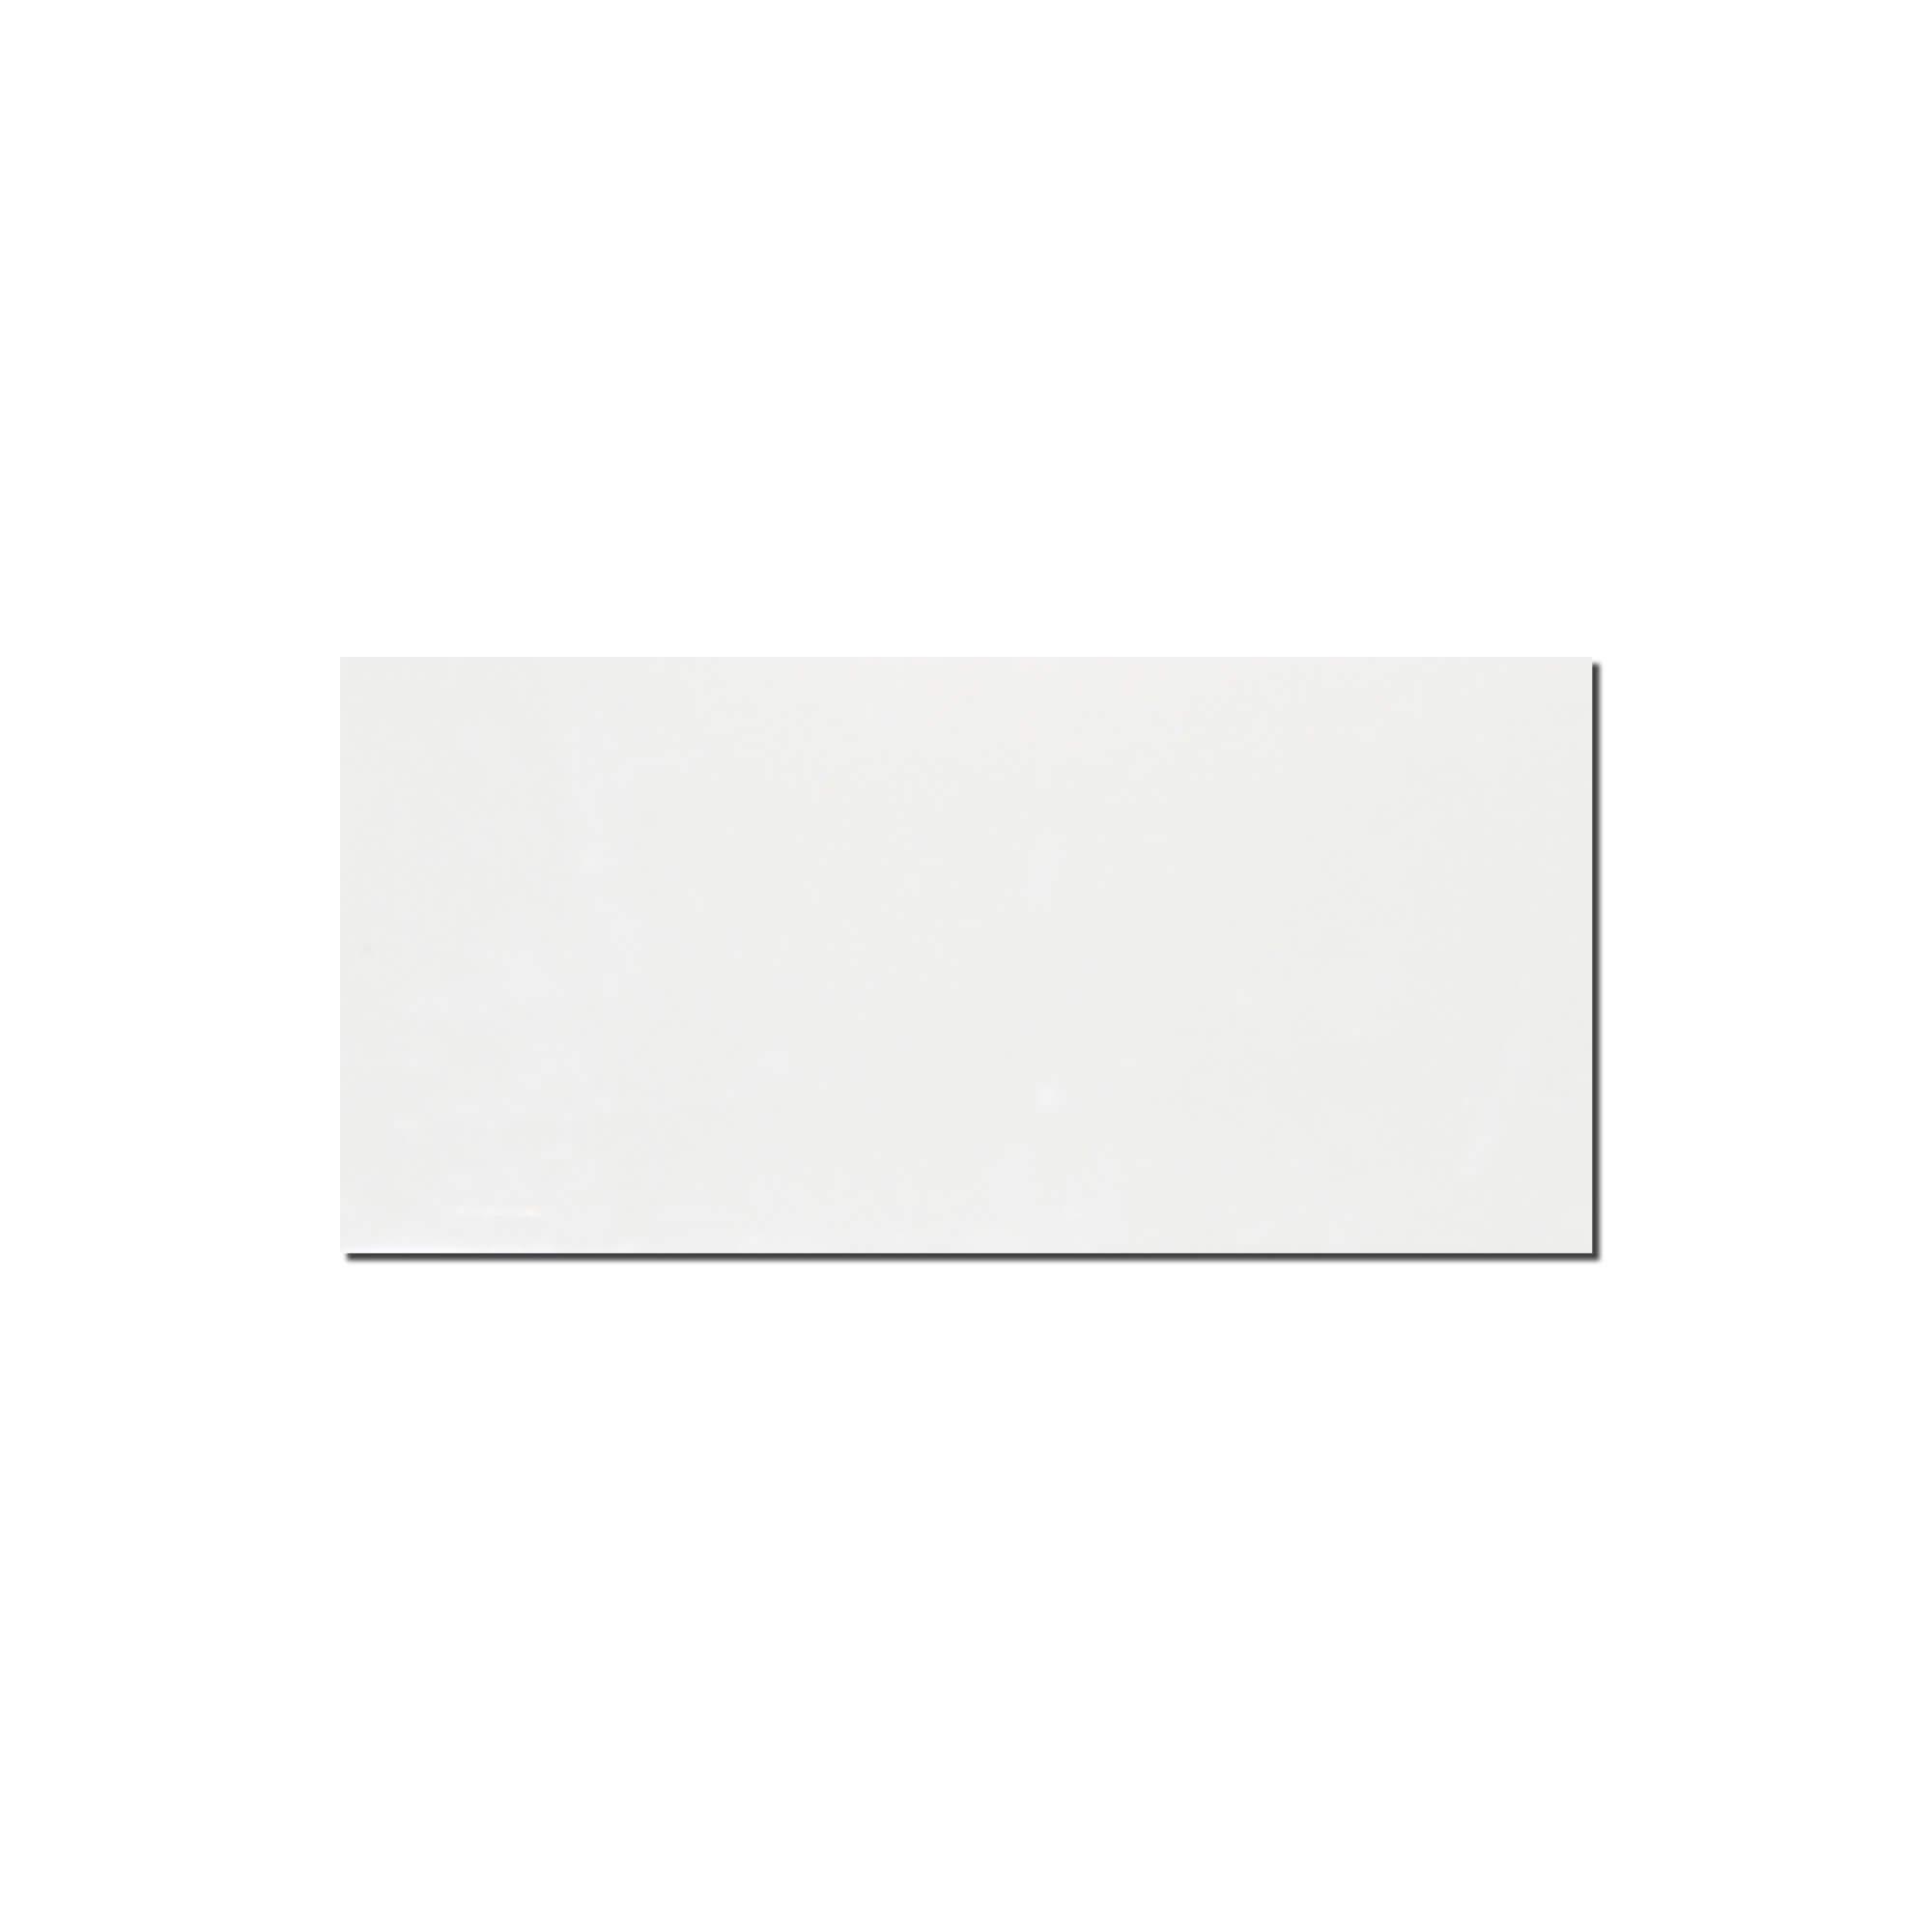 Carrelage mural Blanc Mat 30x60 cm